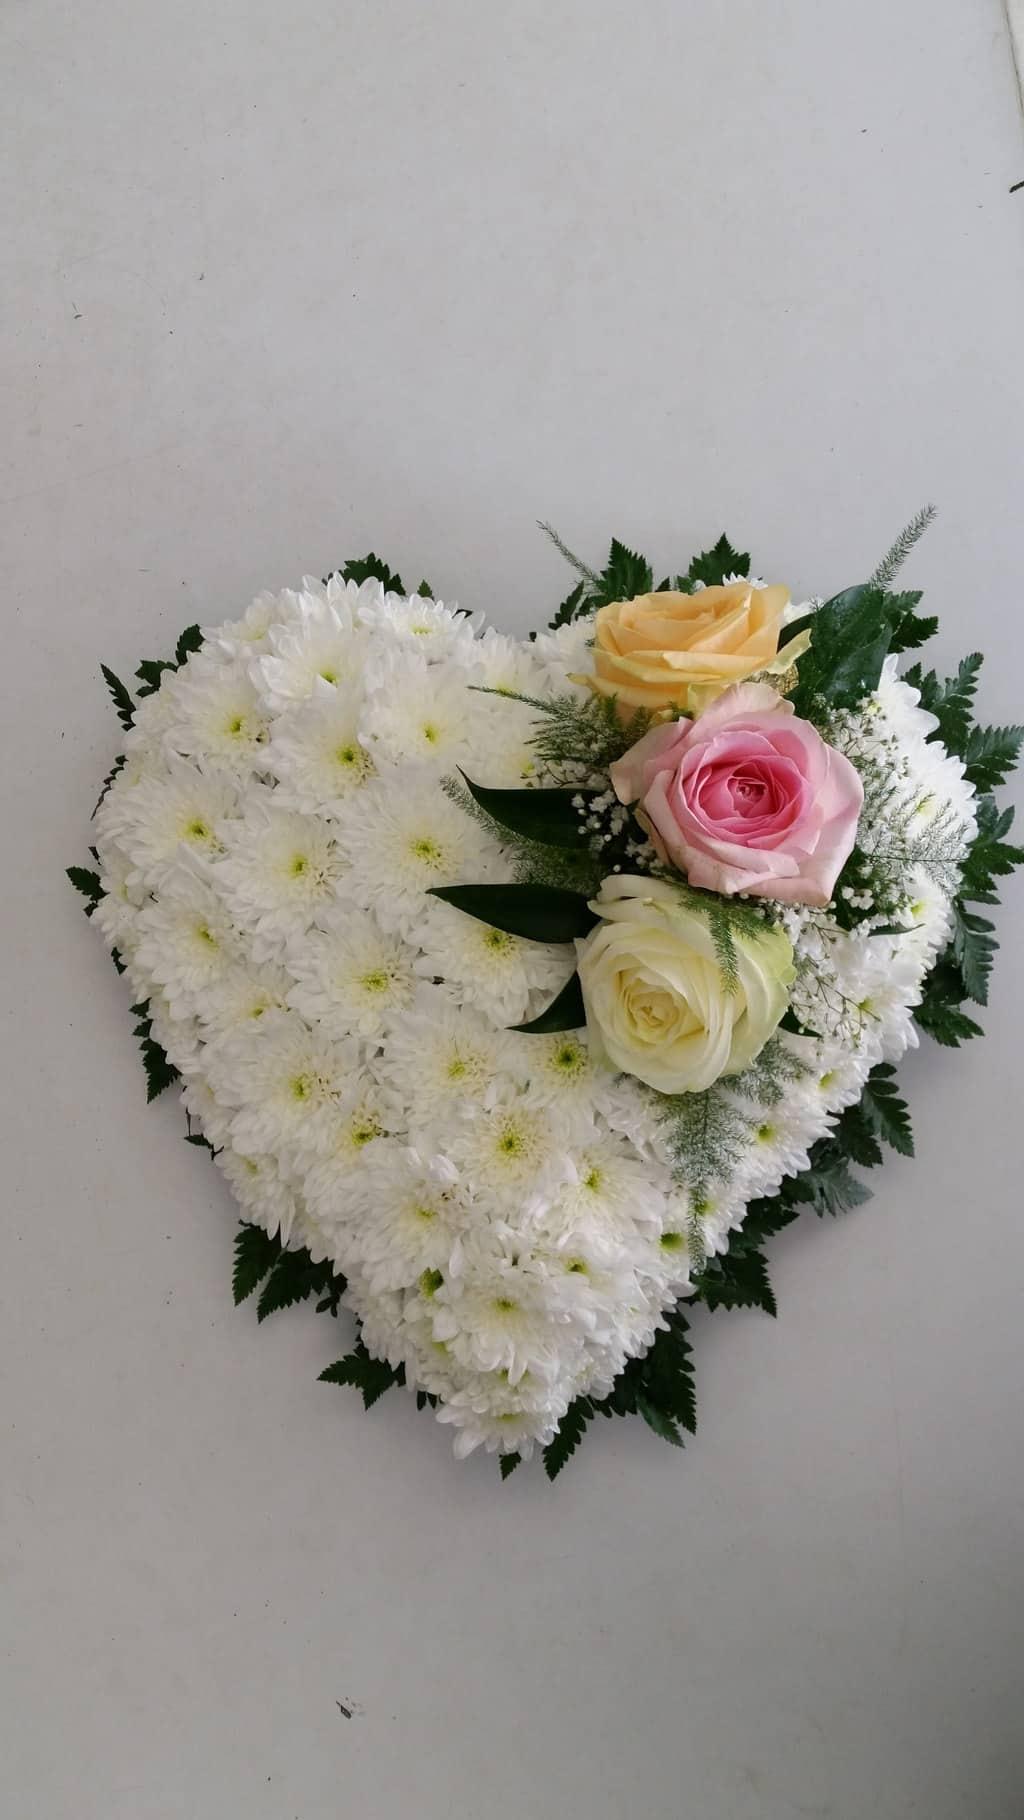 Solid Heart 12 inch   Wild Daisy Florist